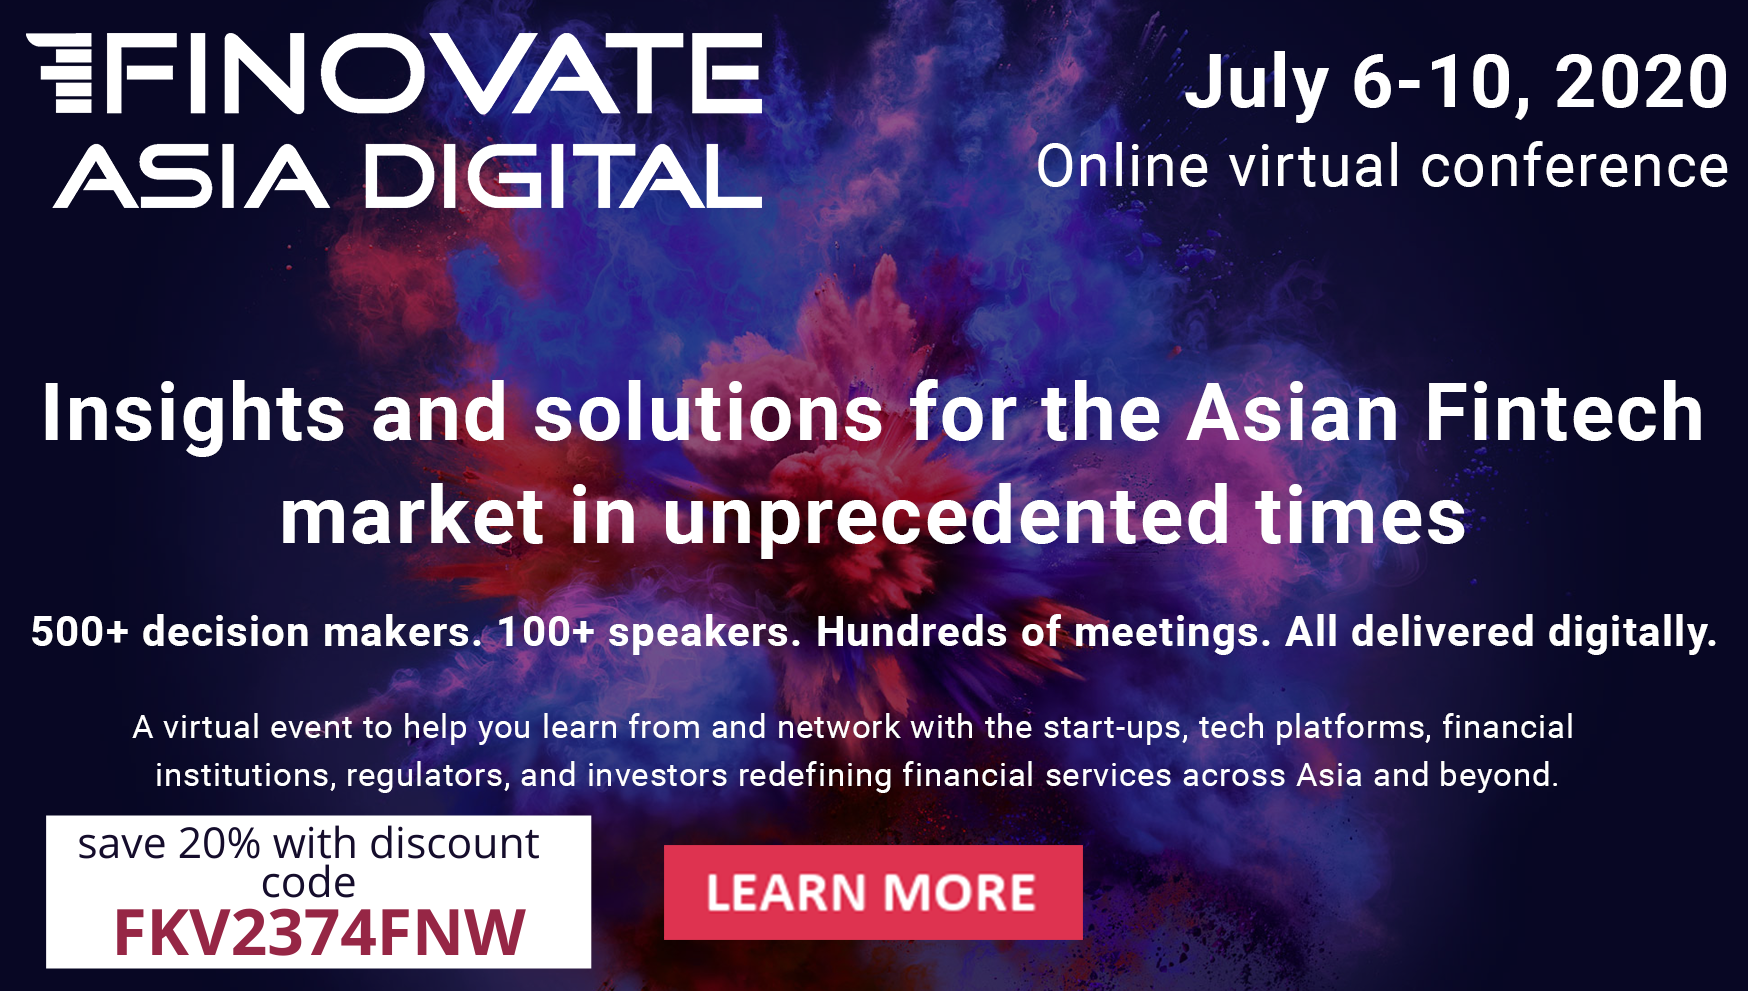 FinovateAsia Digital